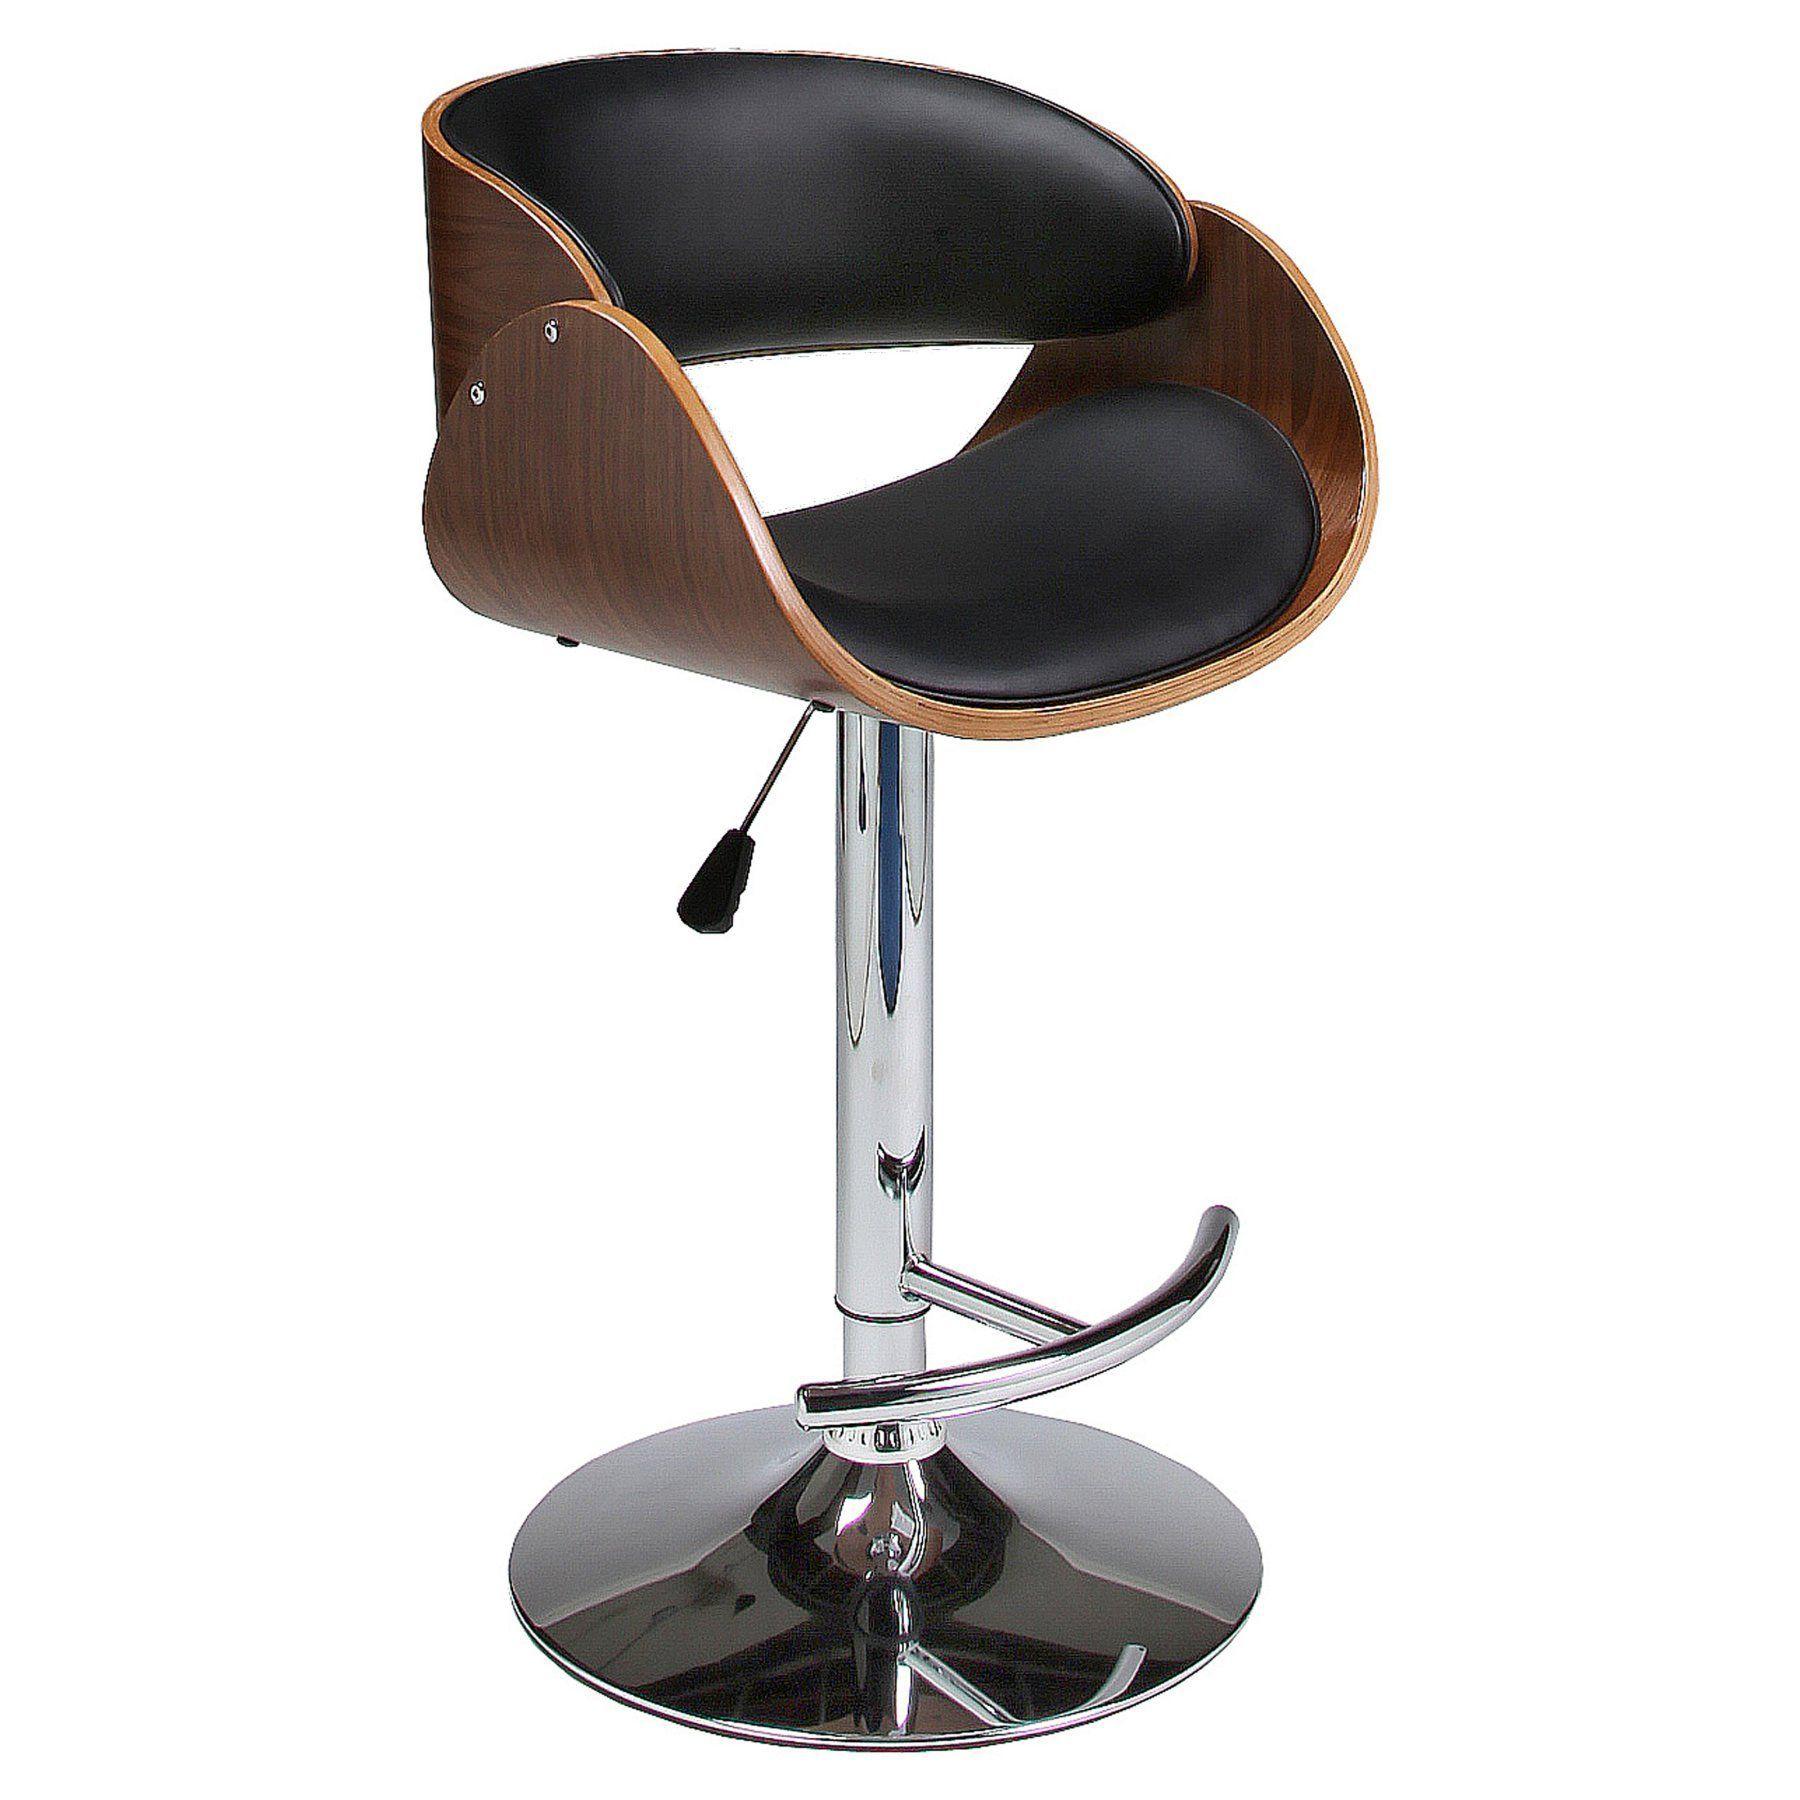 hydraulic bar stools. Impacterra Kaffina Hydraulic Bar Stool - Walnut Veneer / Chrome QLKF21927997969 Stools O